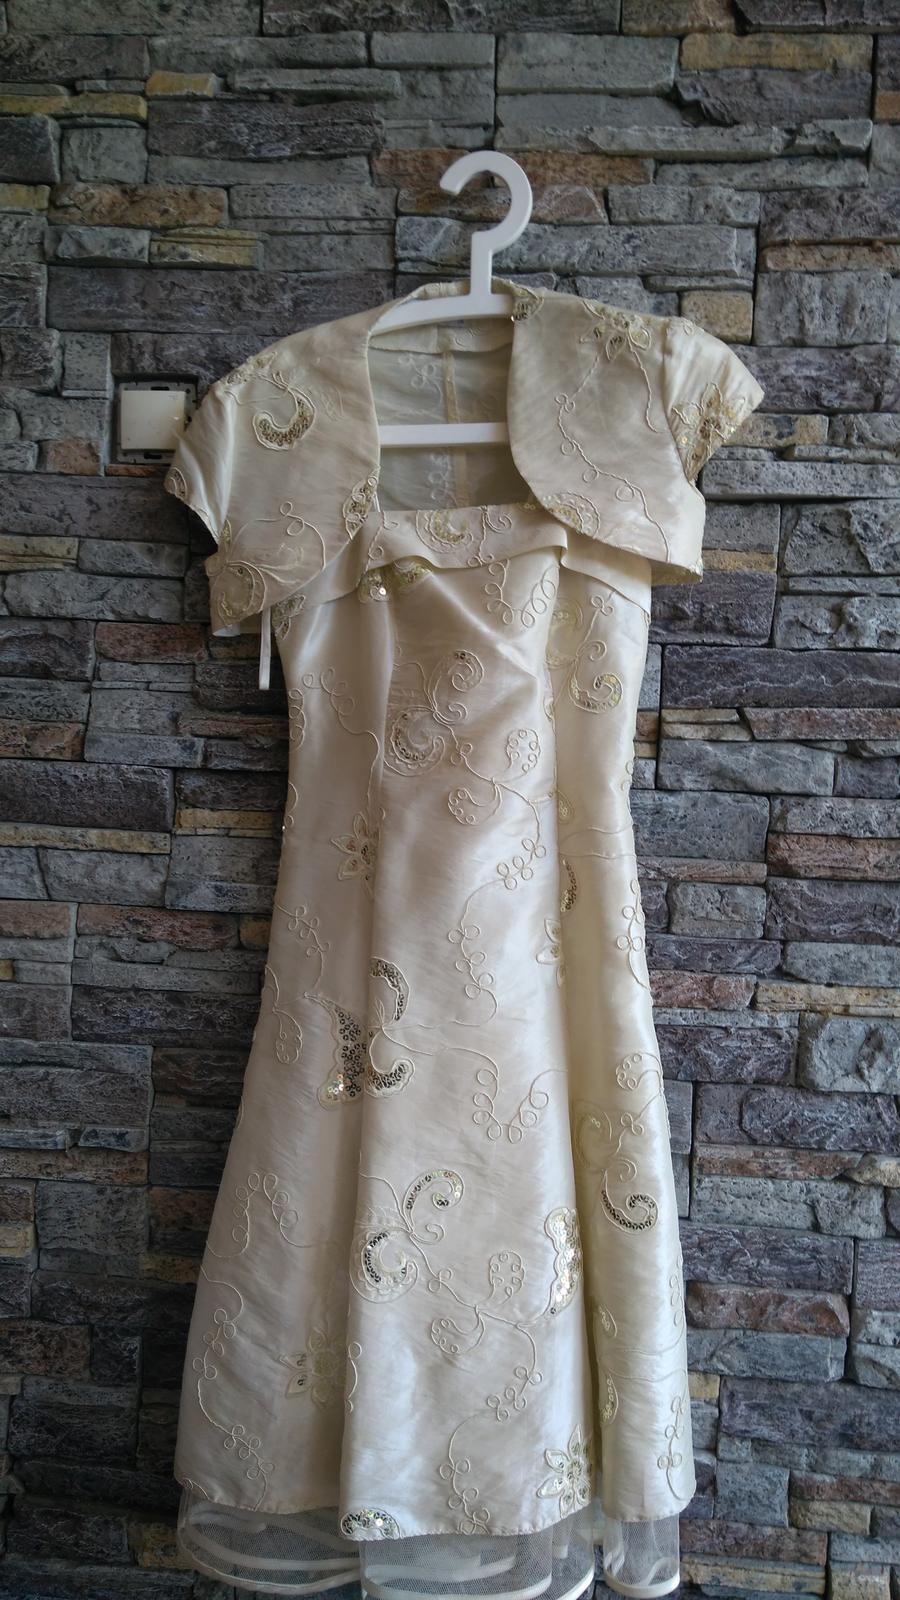 Zlaté šaty s flitrami po kolená - Obrázok č. 1